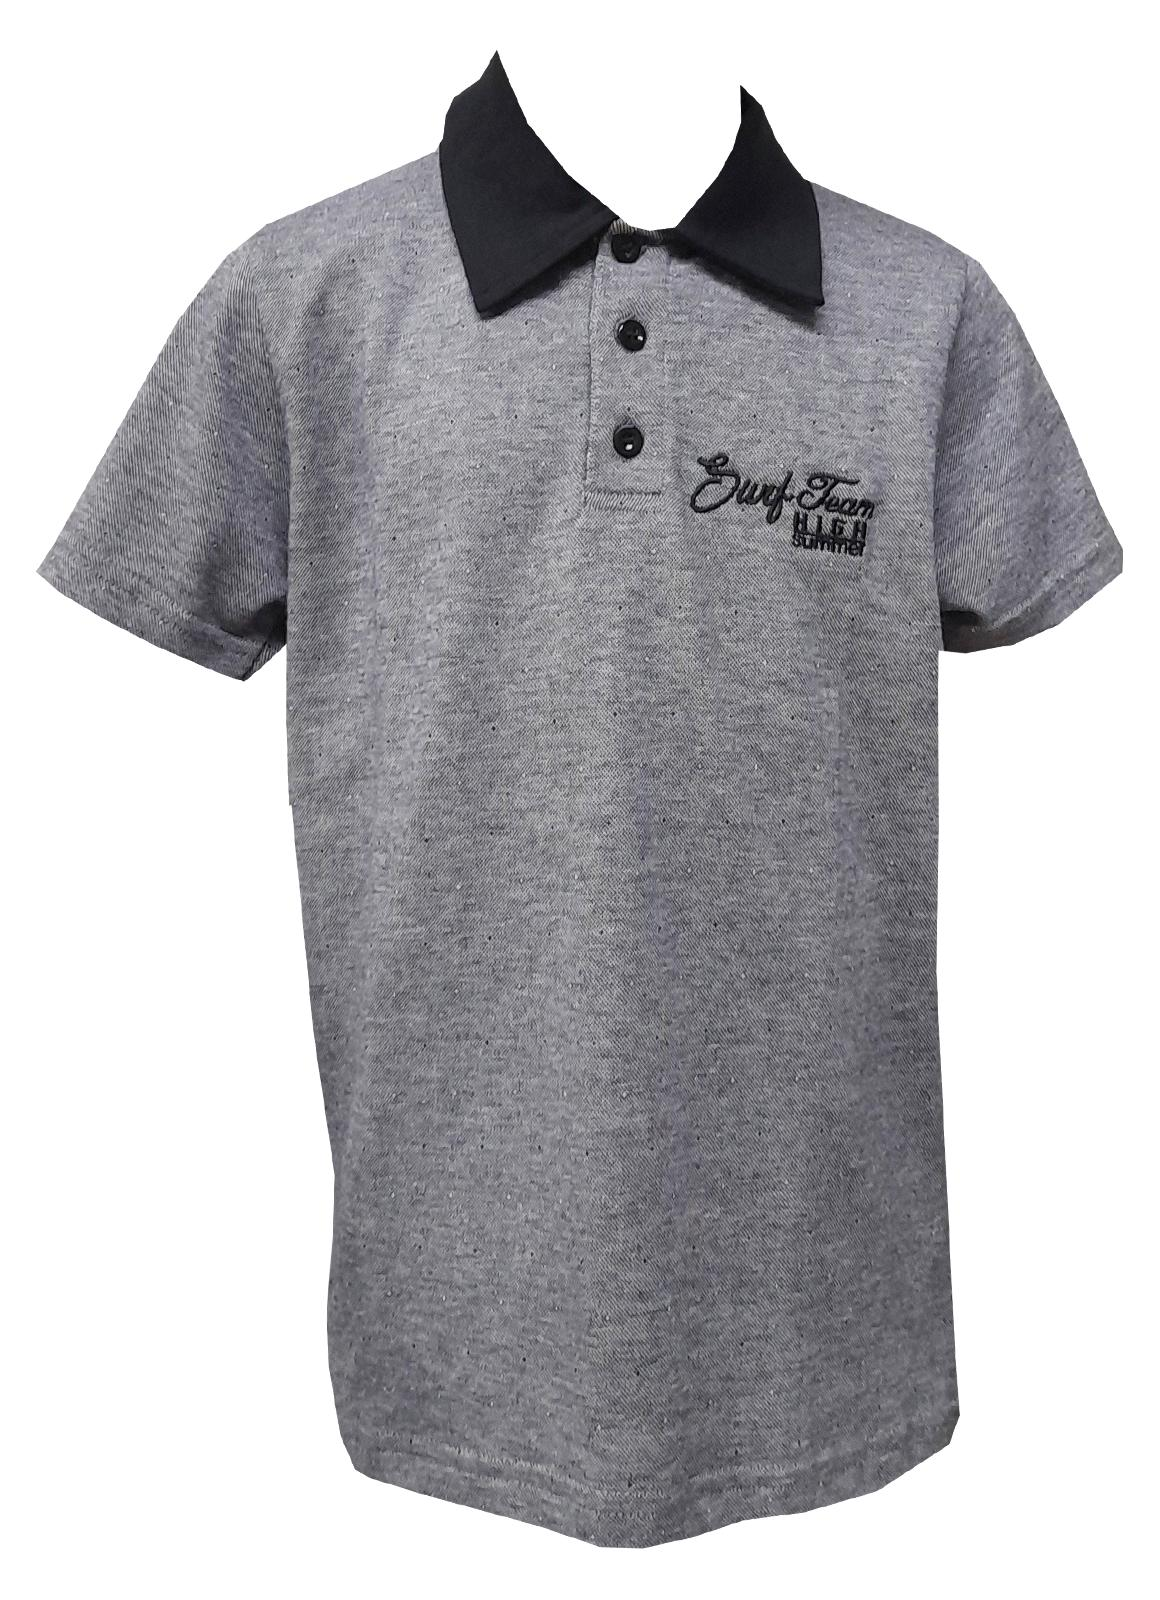 Camisa Polo Carlan infantil masculina